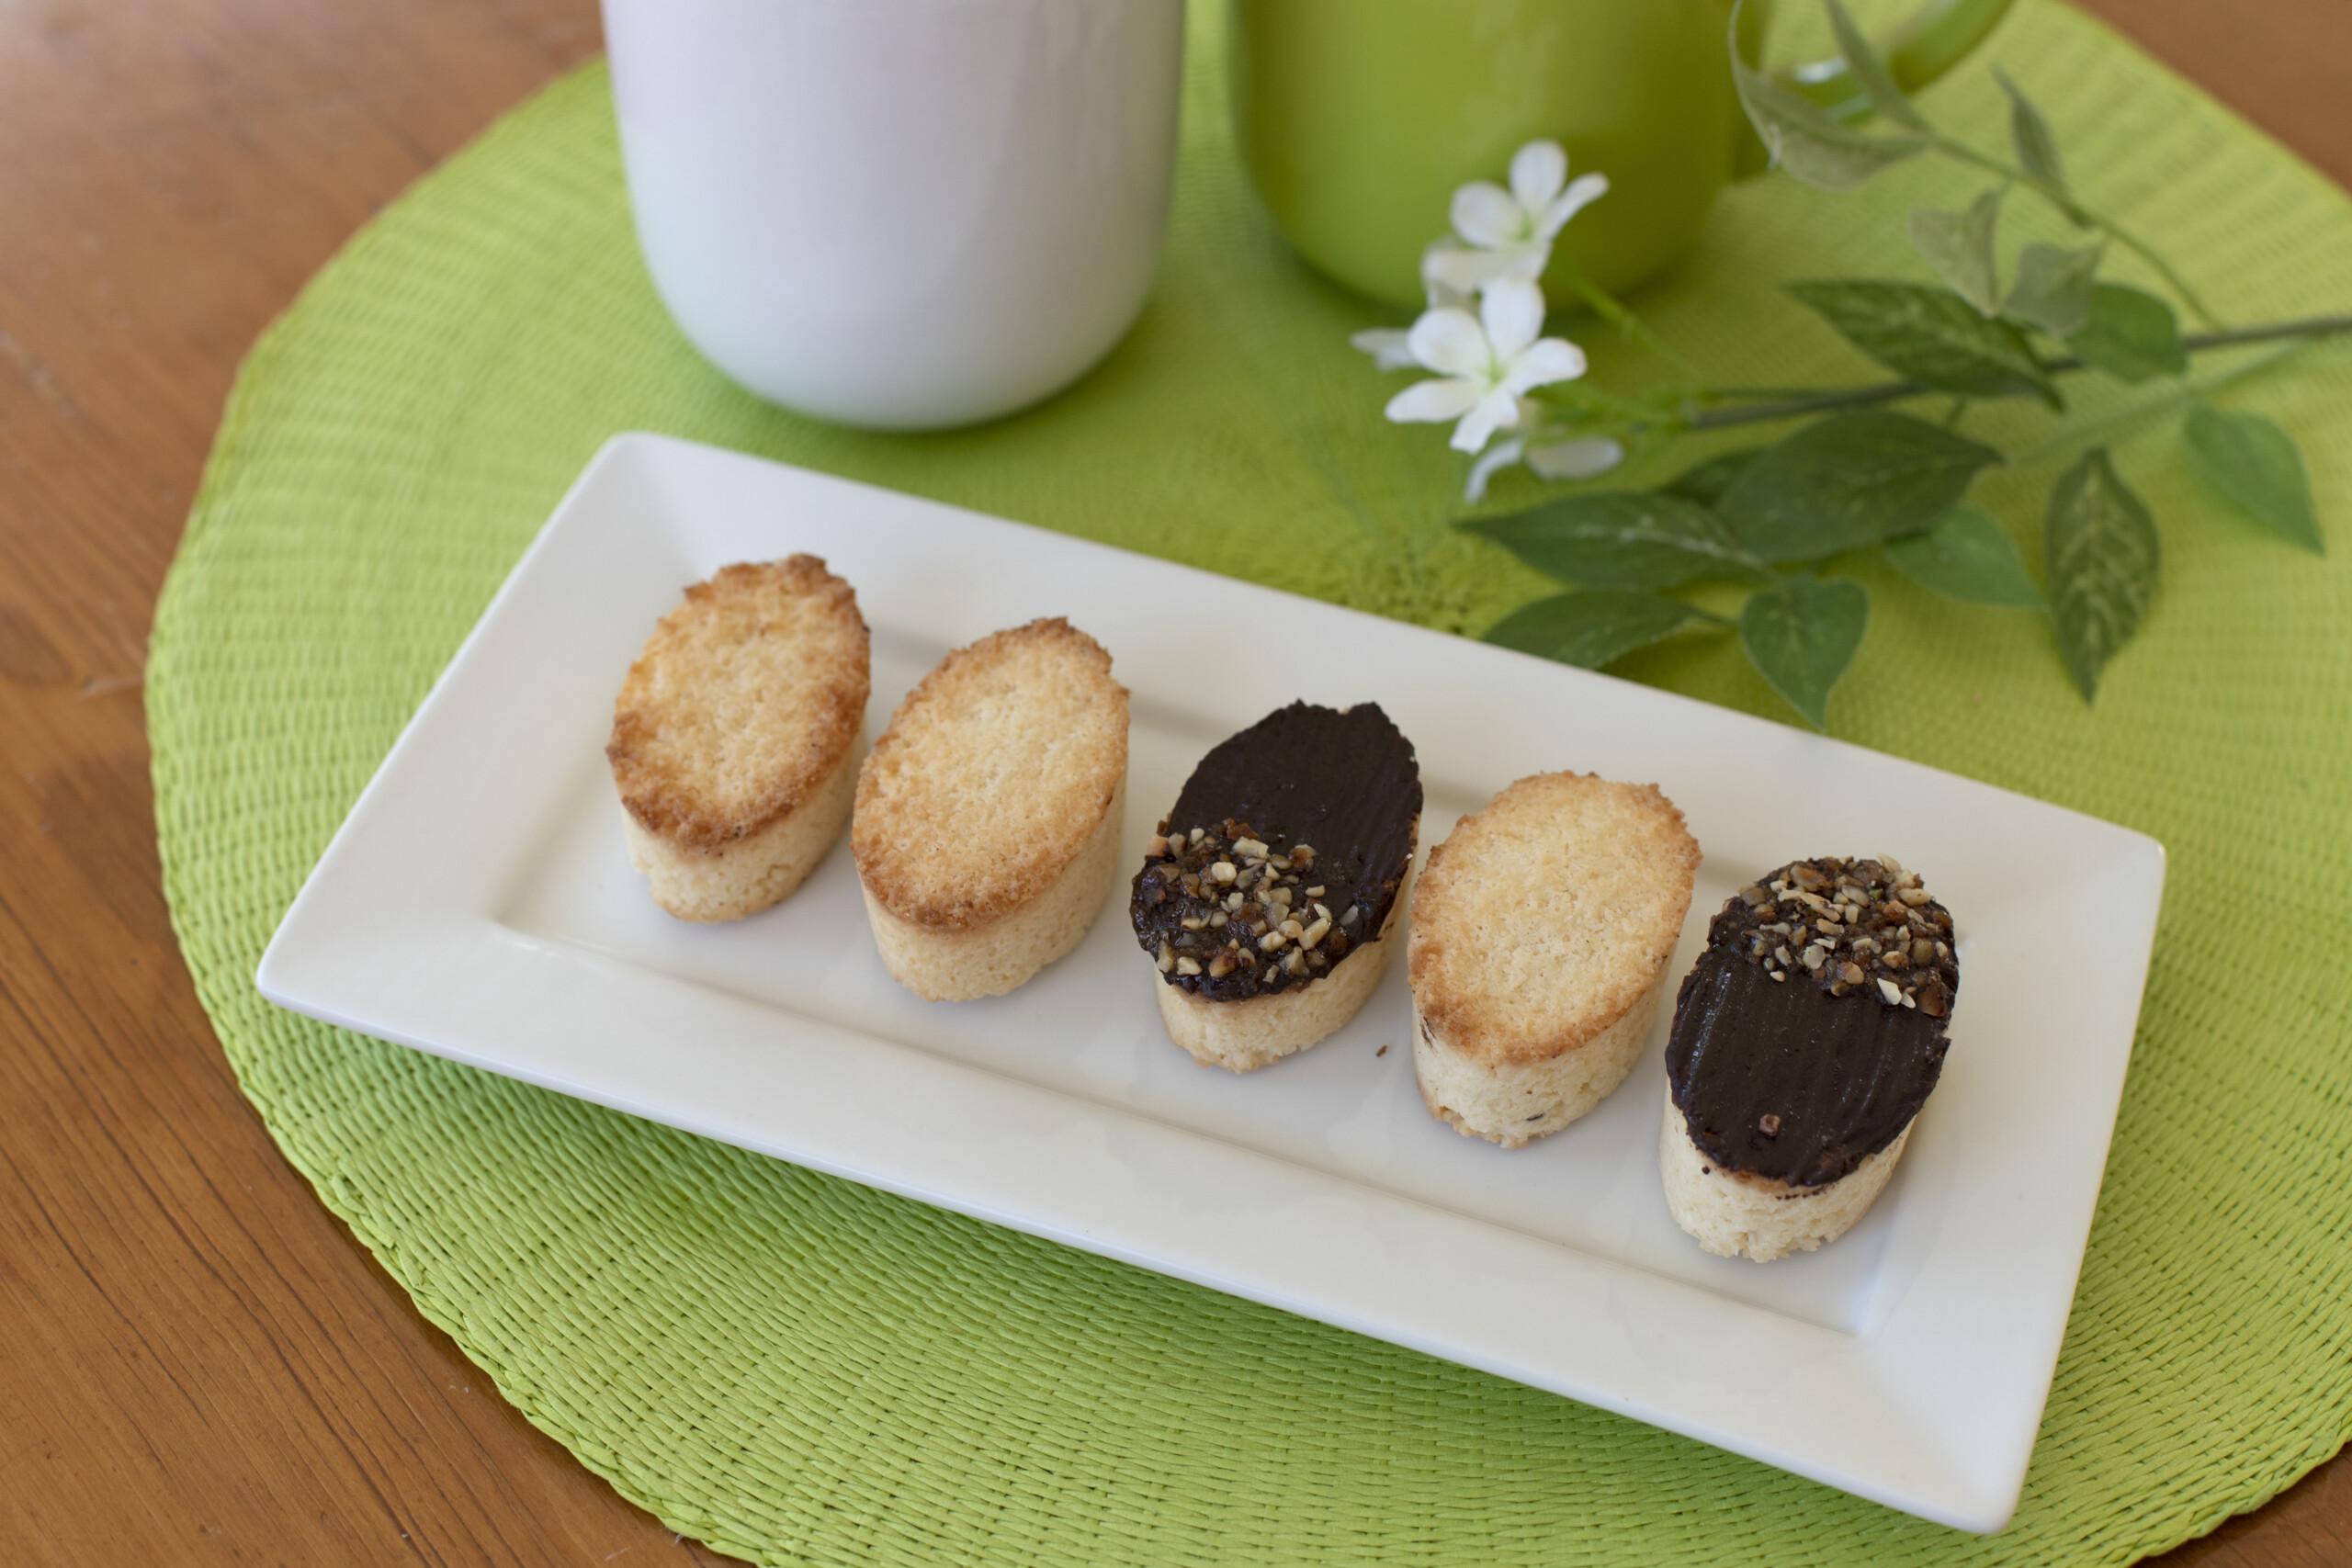 Biscotti ovali al cocco